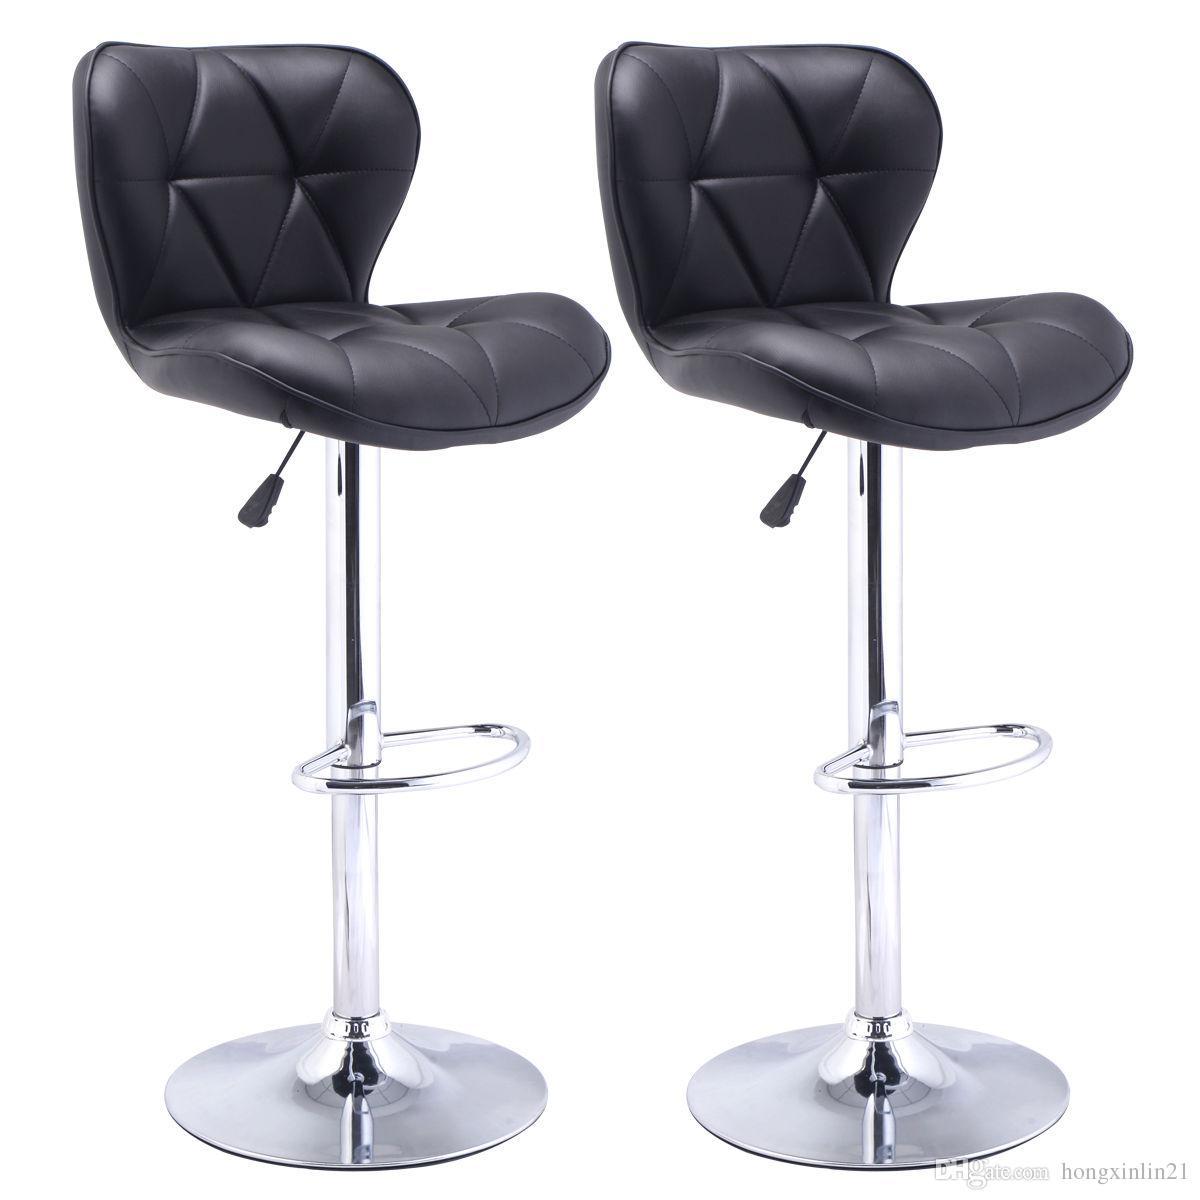 Astonishing Of 2 Bar Stools Leather Modern Hydraulic Swivel Dinning Chair Barstool Black From Hongxinlin21 55 28 Dhgate Com Machost Co Dining Chair Design Ideas Machostcouk